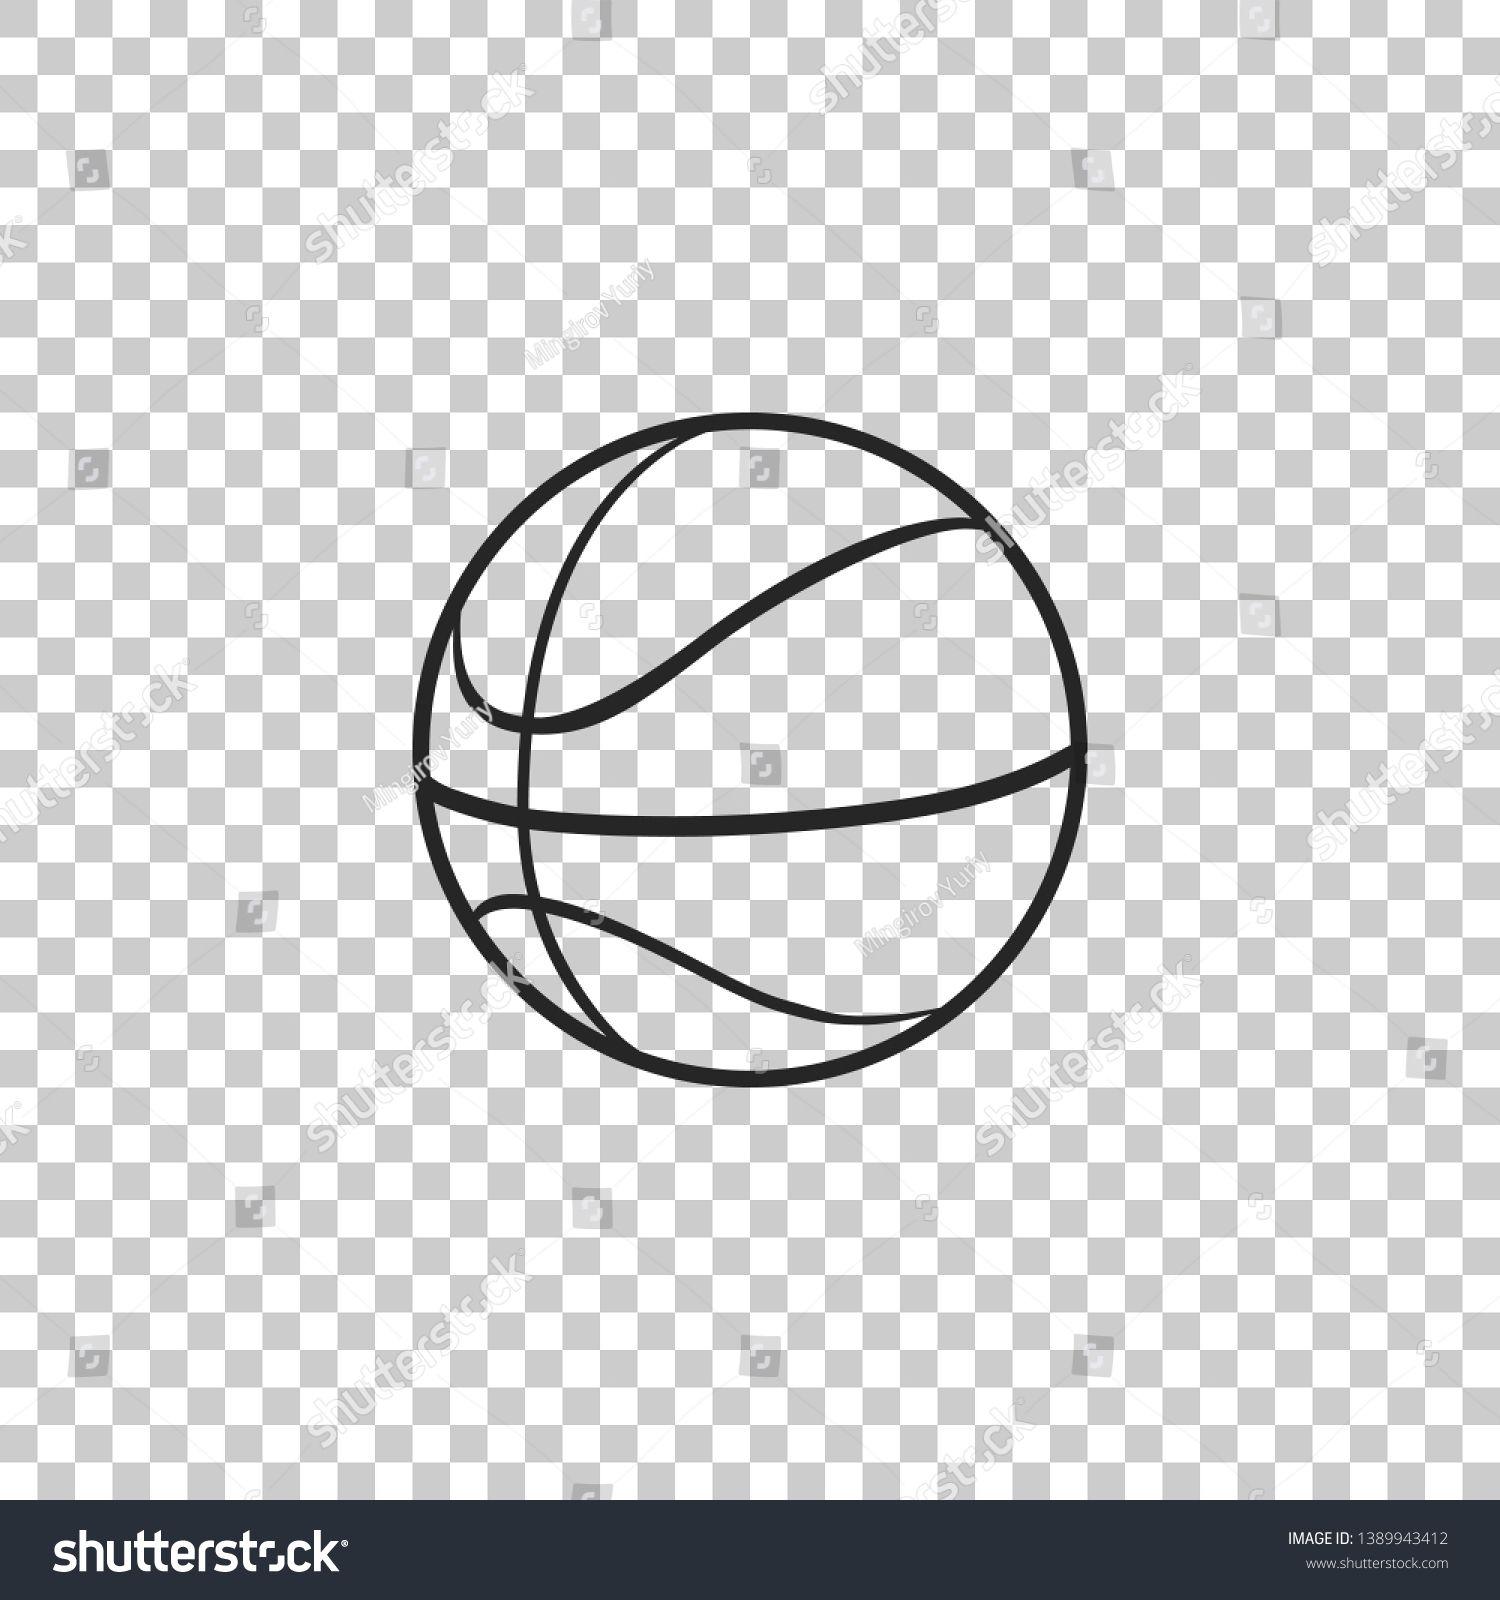 Basketball Ball Icon Isolated On Transparent Background Sport Symbol Flat Design Ad Spon Isolated Transparent Icon Basketb Basketball Ball Icon Symbols